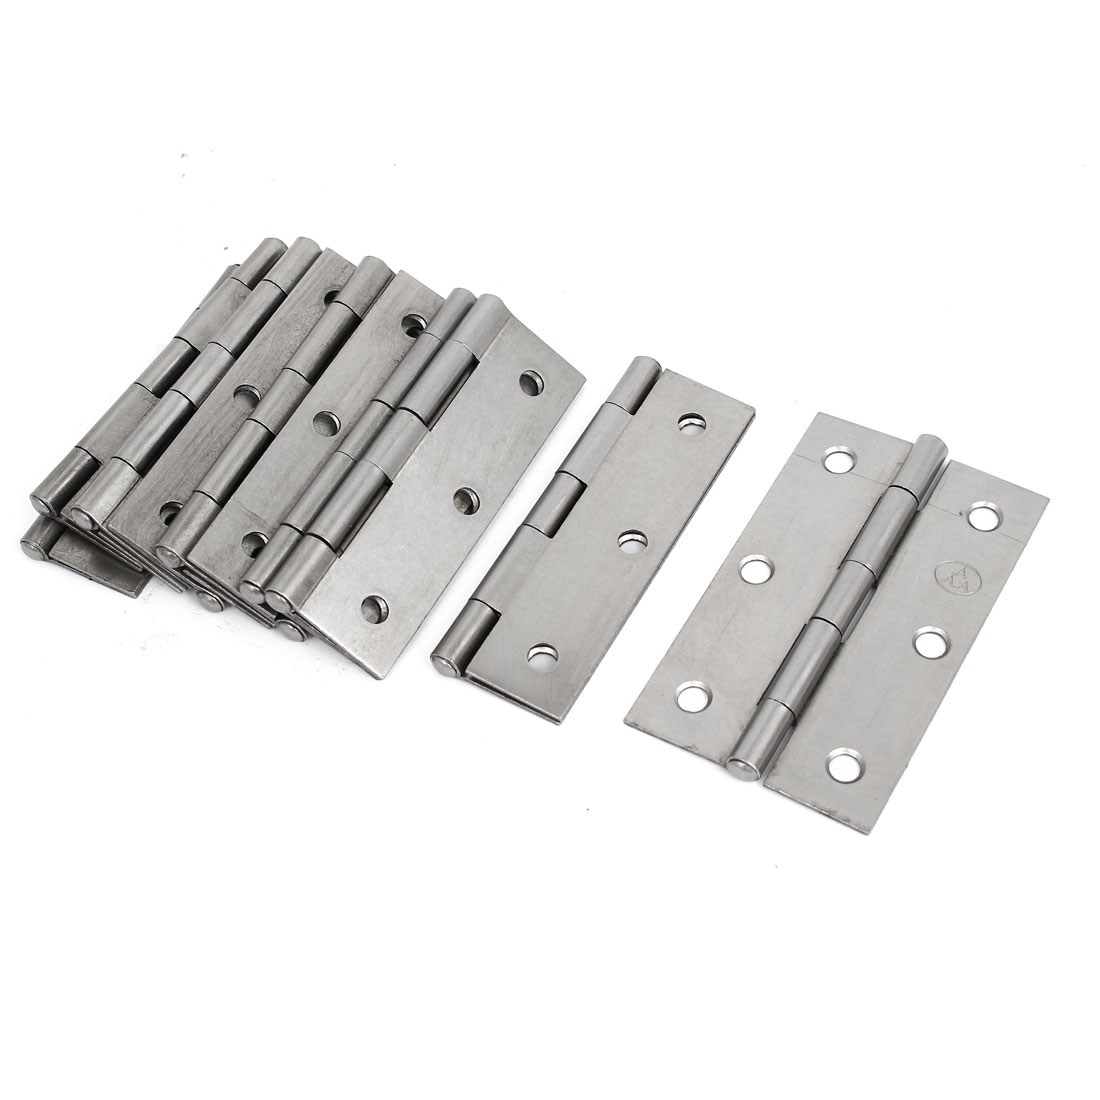 "Home Furniture Cupboard Door Iron Butt Hinge Silver Gray 3.5"" Long 10pcs"